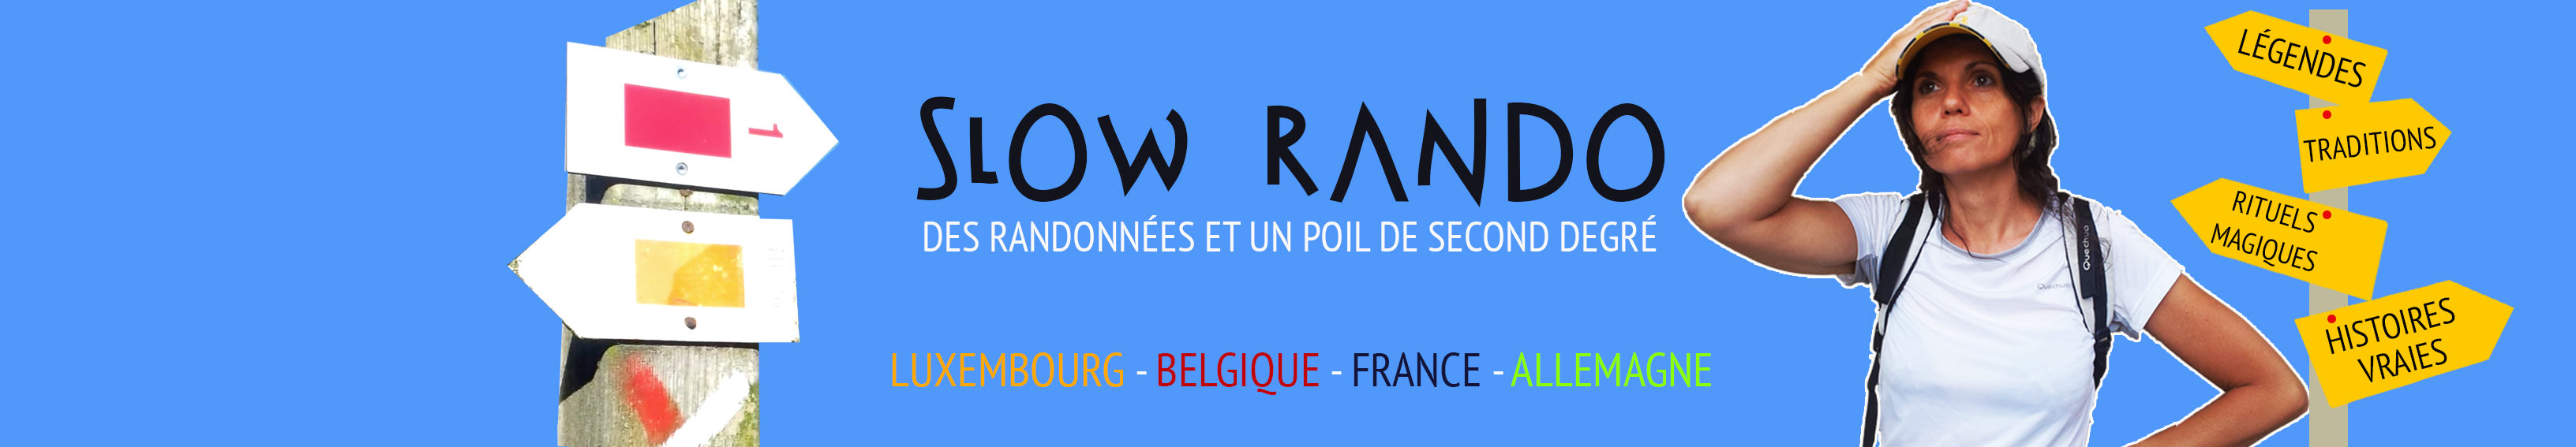 Slow Rando